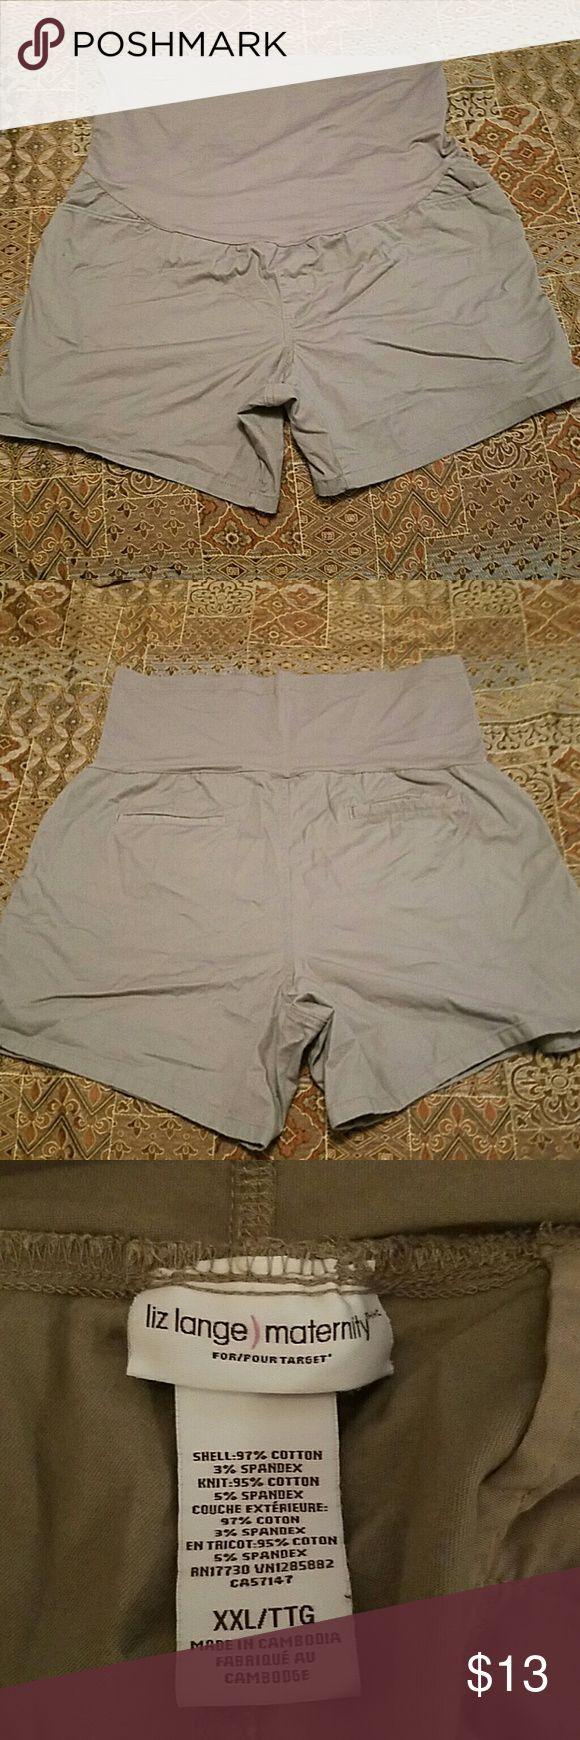 Maternity Shorts xxl Kaki maternity Shorts by Liz Lange. Size xxl. No holes stains ect. Very comfy and cute! Liz Lange Shorts